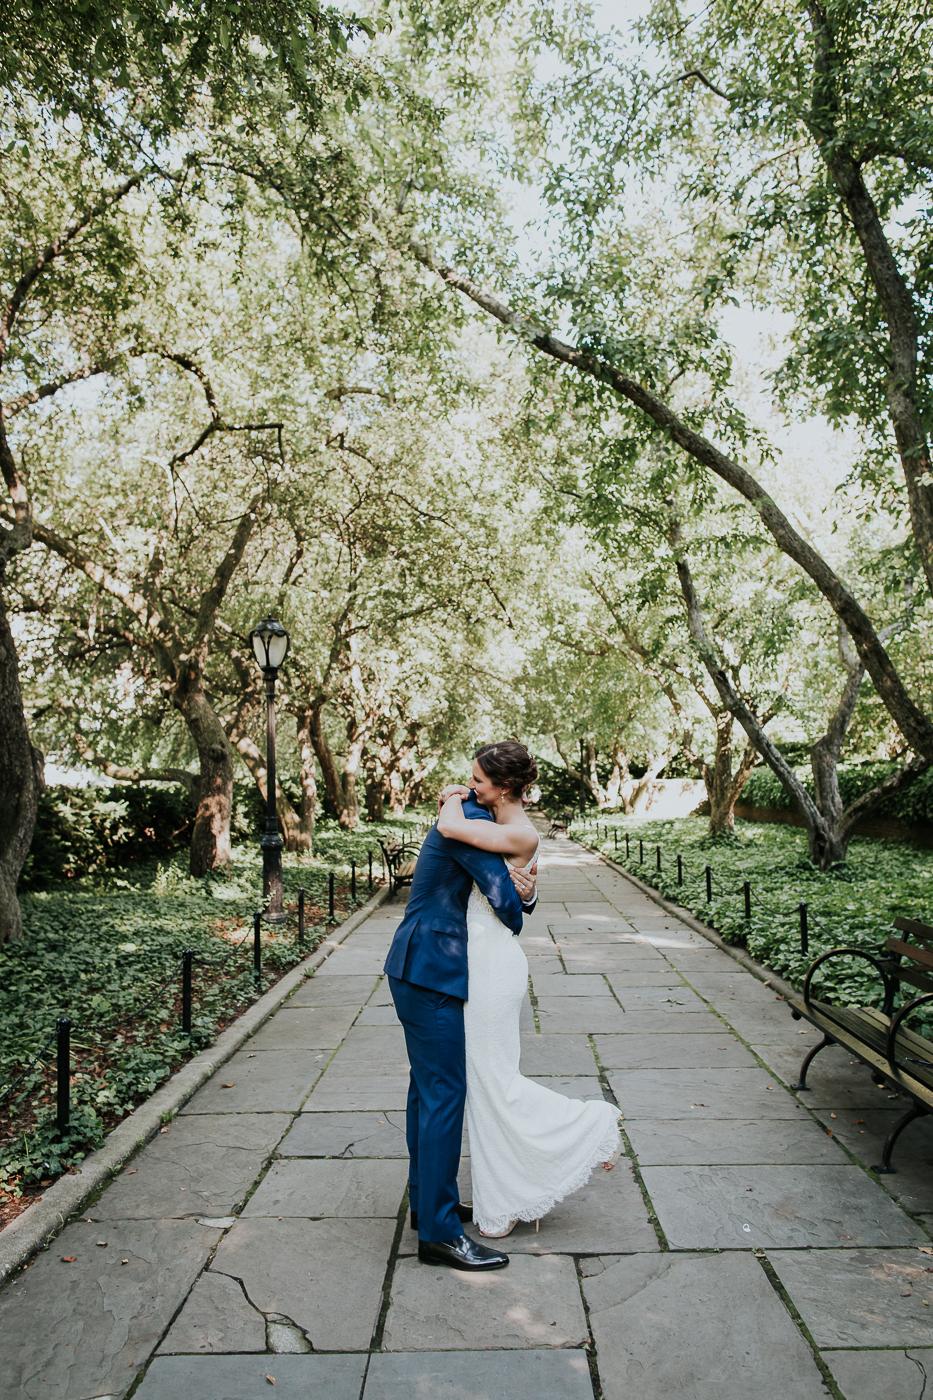 NYC-Central-Park-Conservatory-Garden-Intimate-Elopement-Documentary-Wedding-Photographer-38.jpg